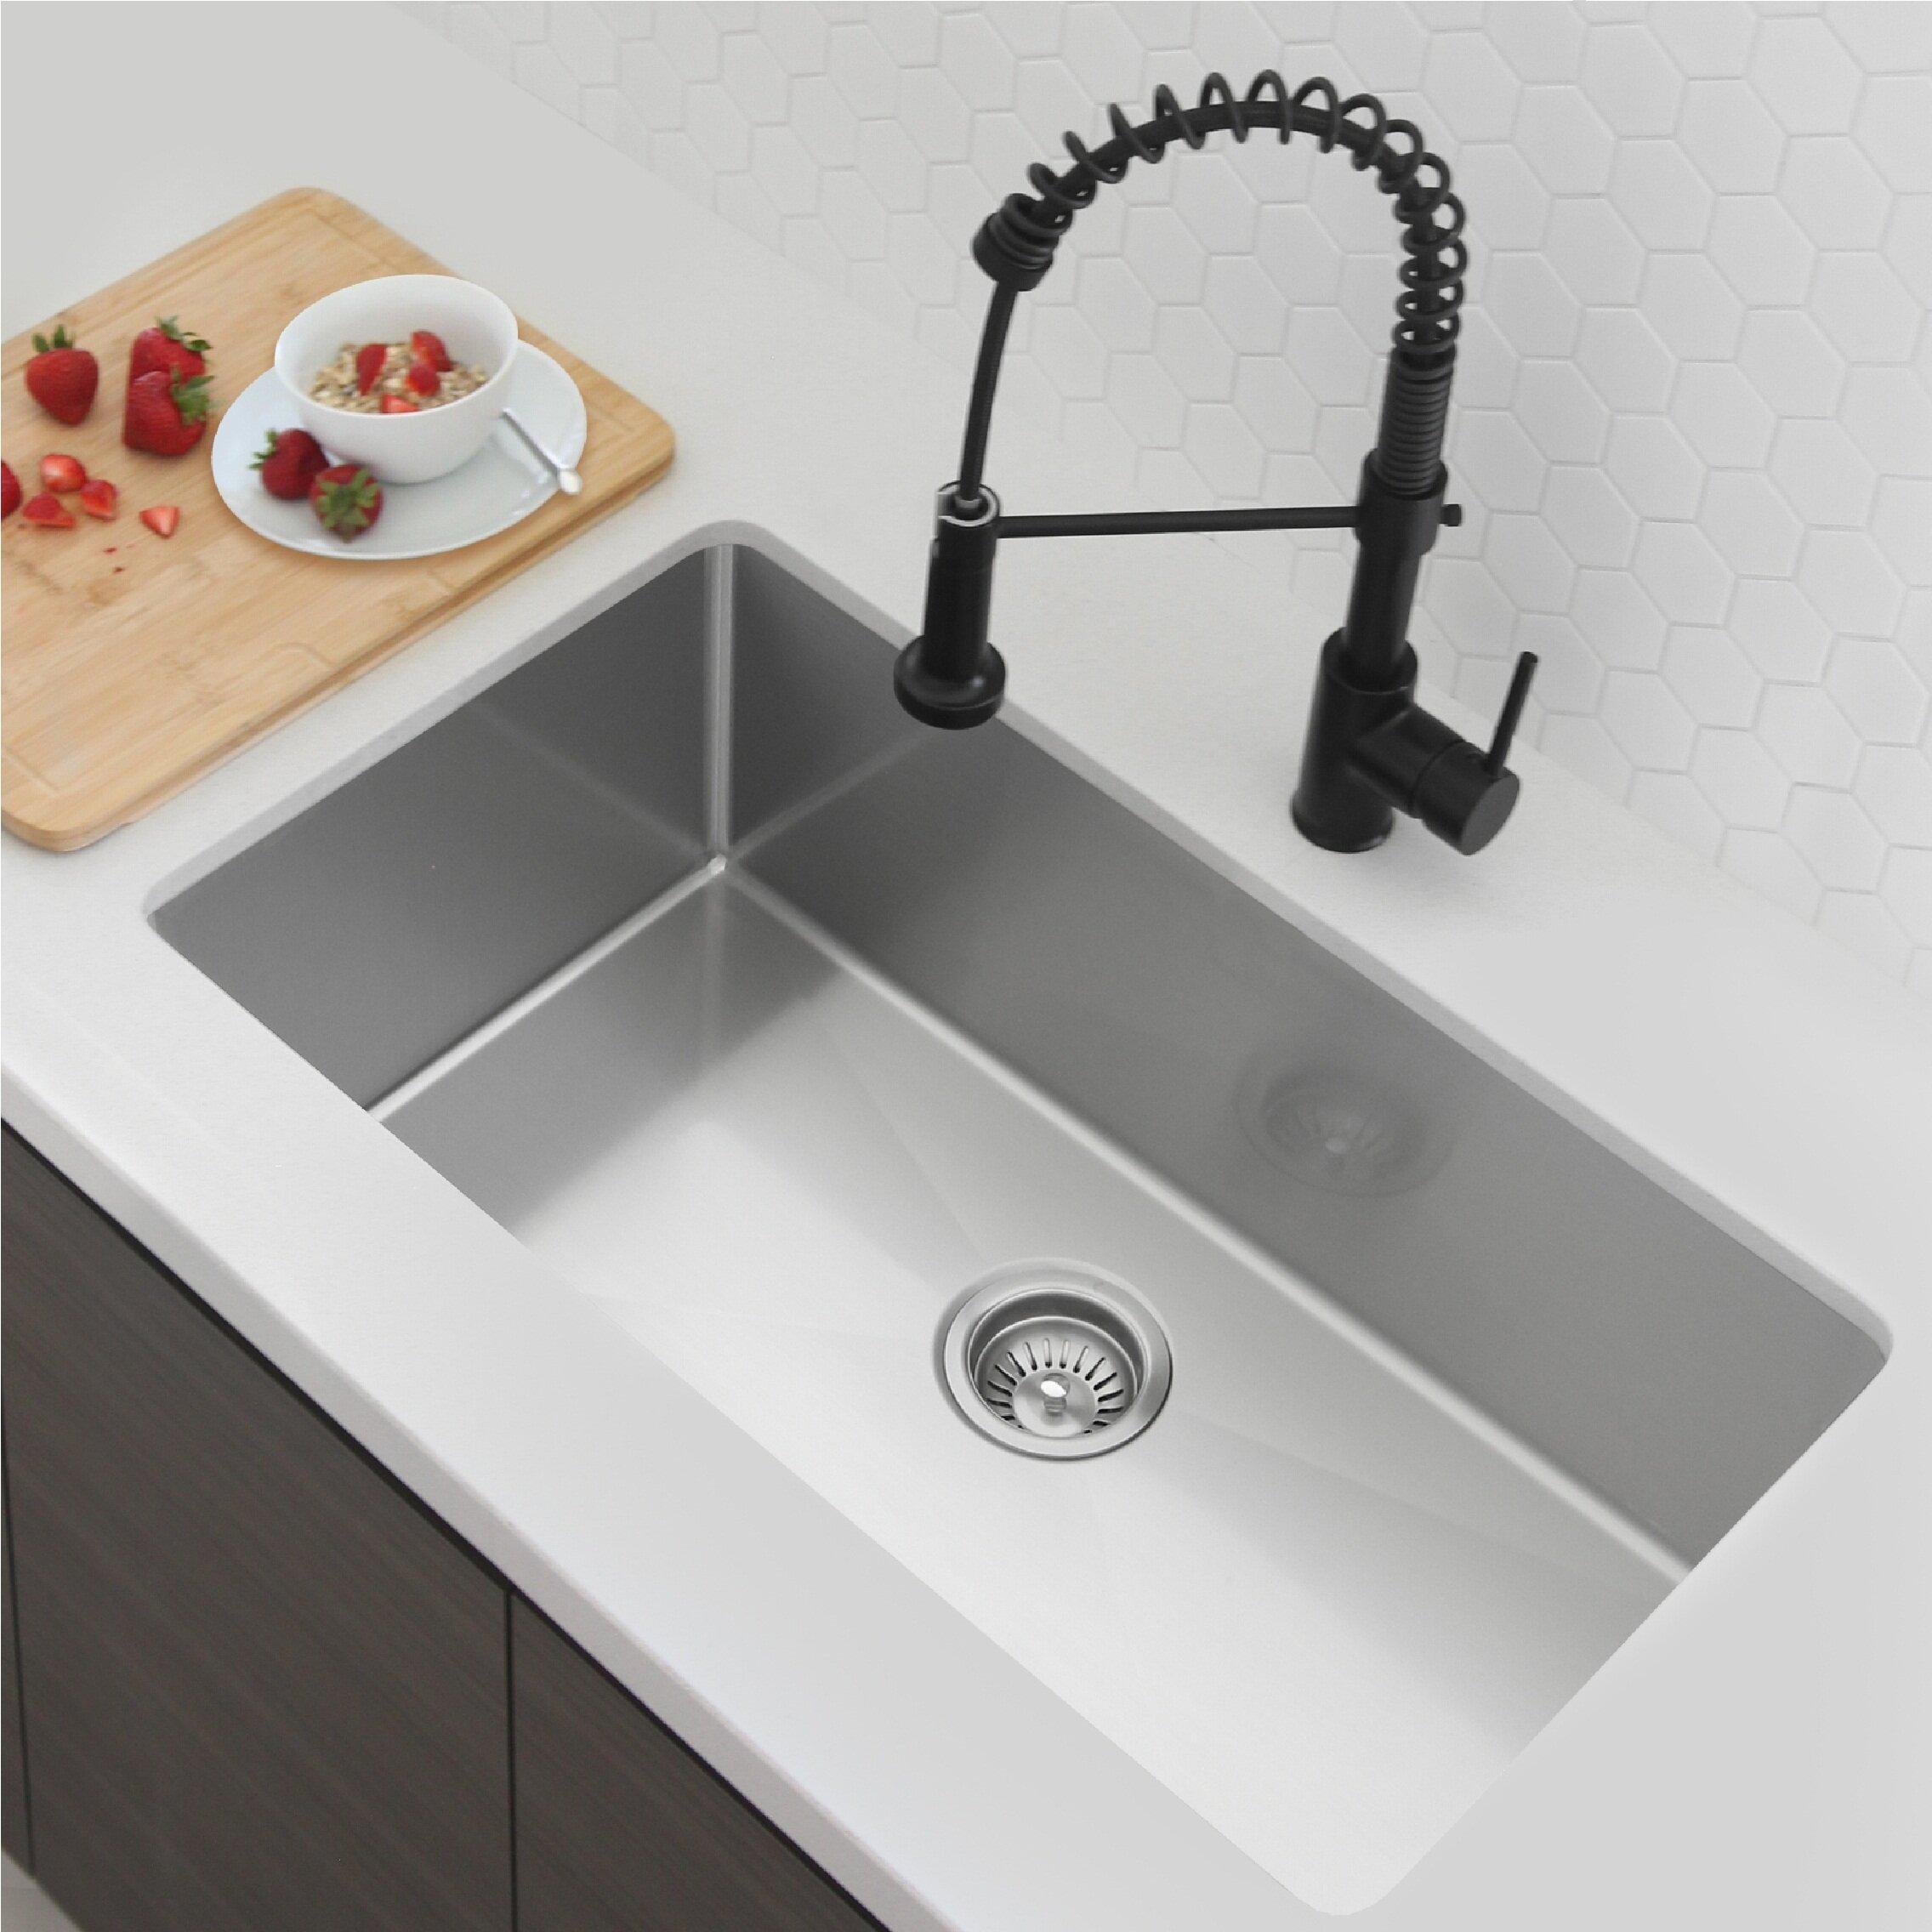 Stylish 31 L X 18 W Single Basin Undermount Kitchen Sink With Strainer Wayfair